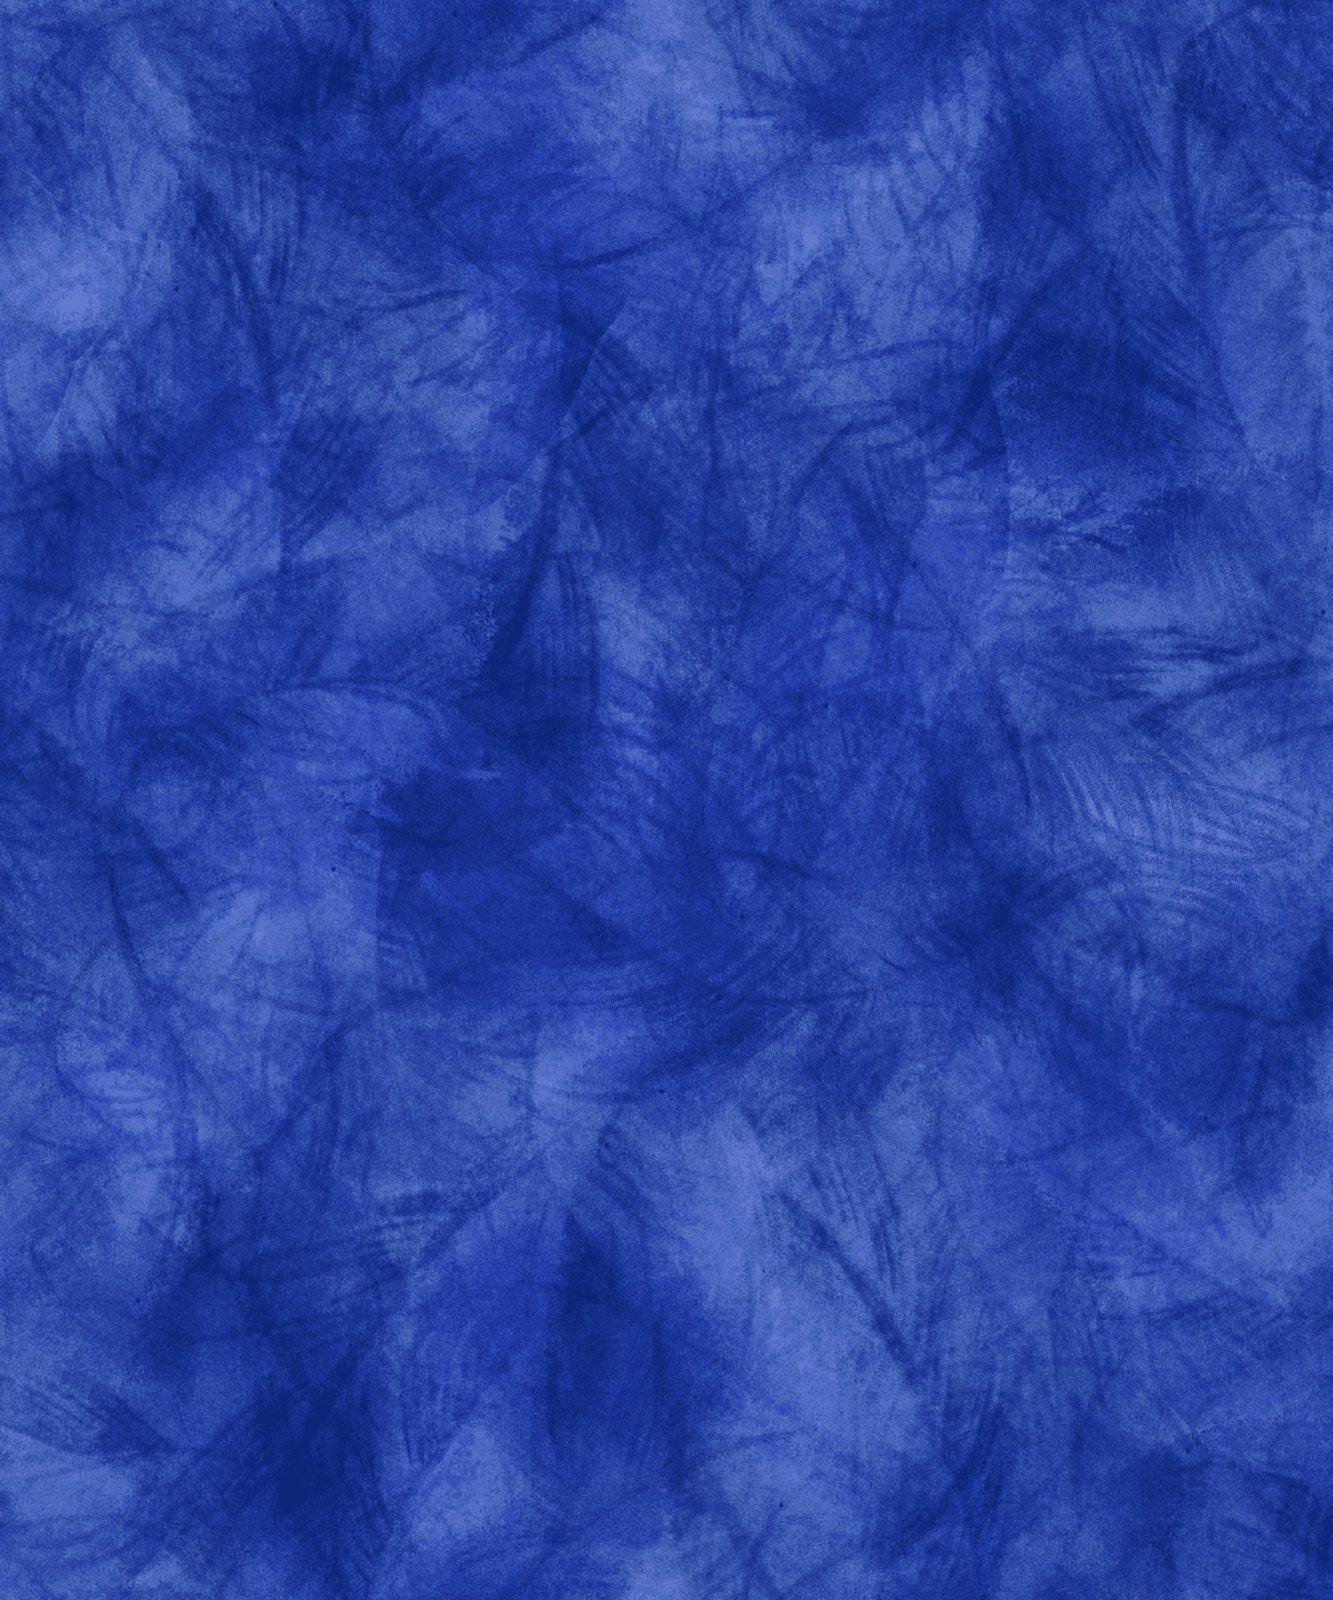 Oasis Fabrics - 118 - Etchings - Royal - 1820004 - Blue